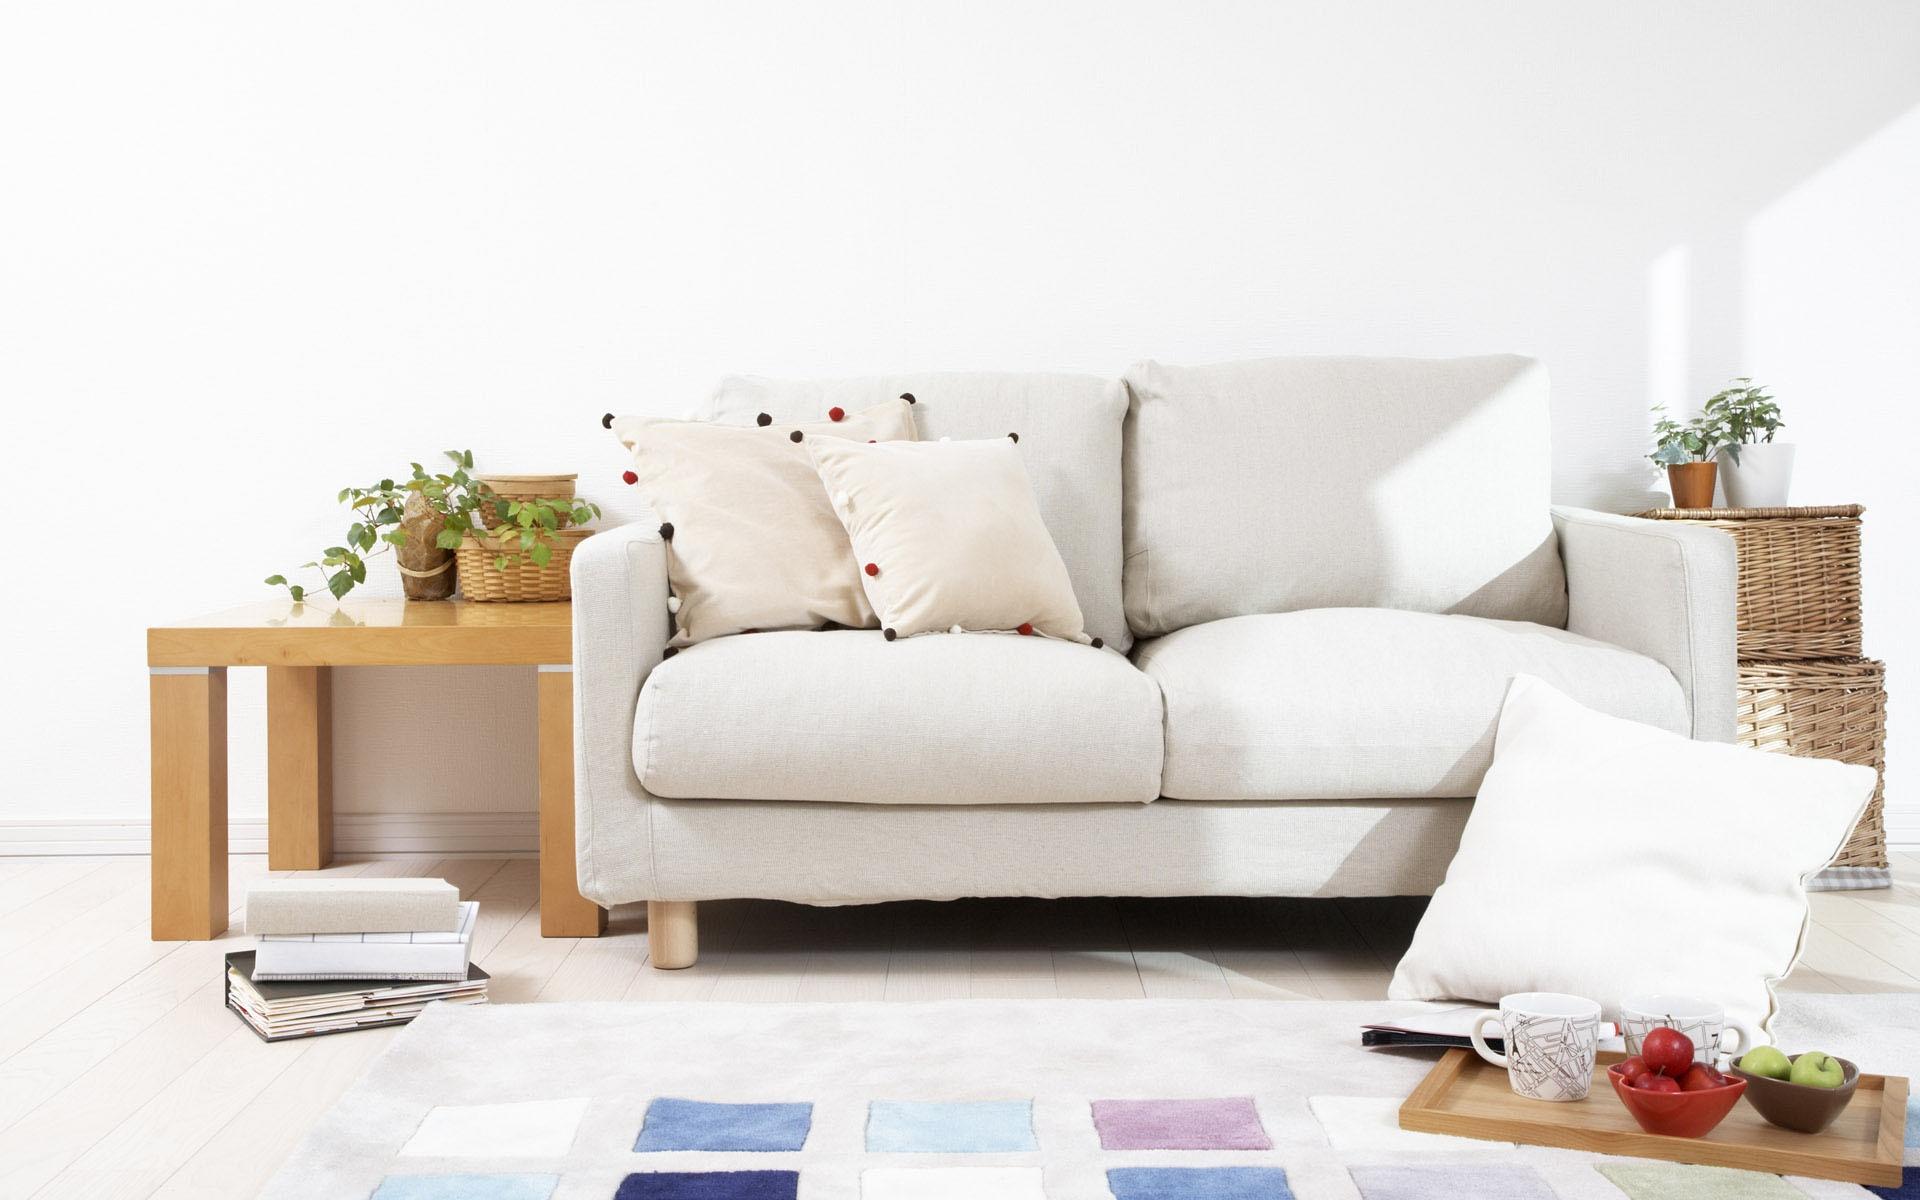 Home interior wallpapers wallpapersafari for Hd designs home decor